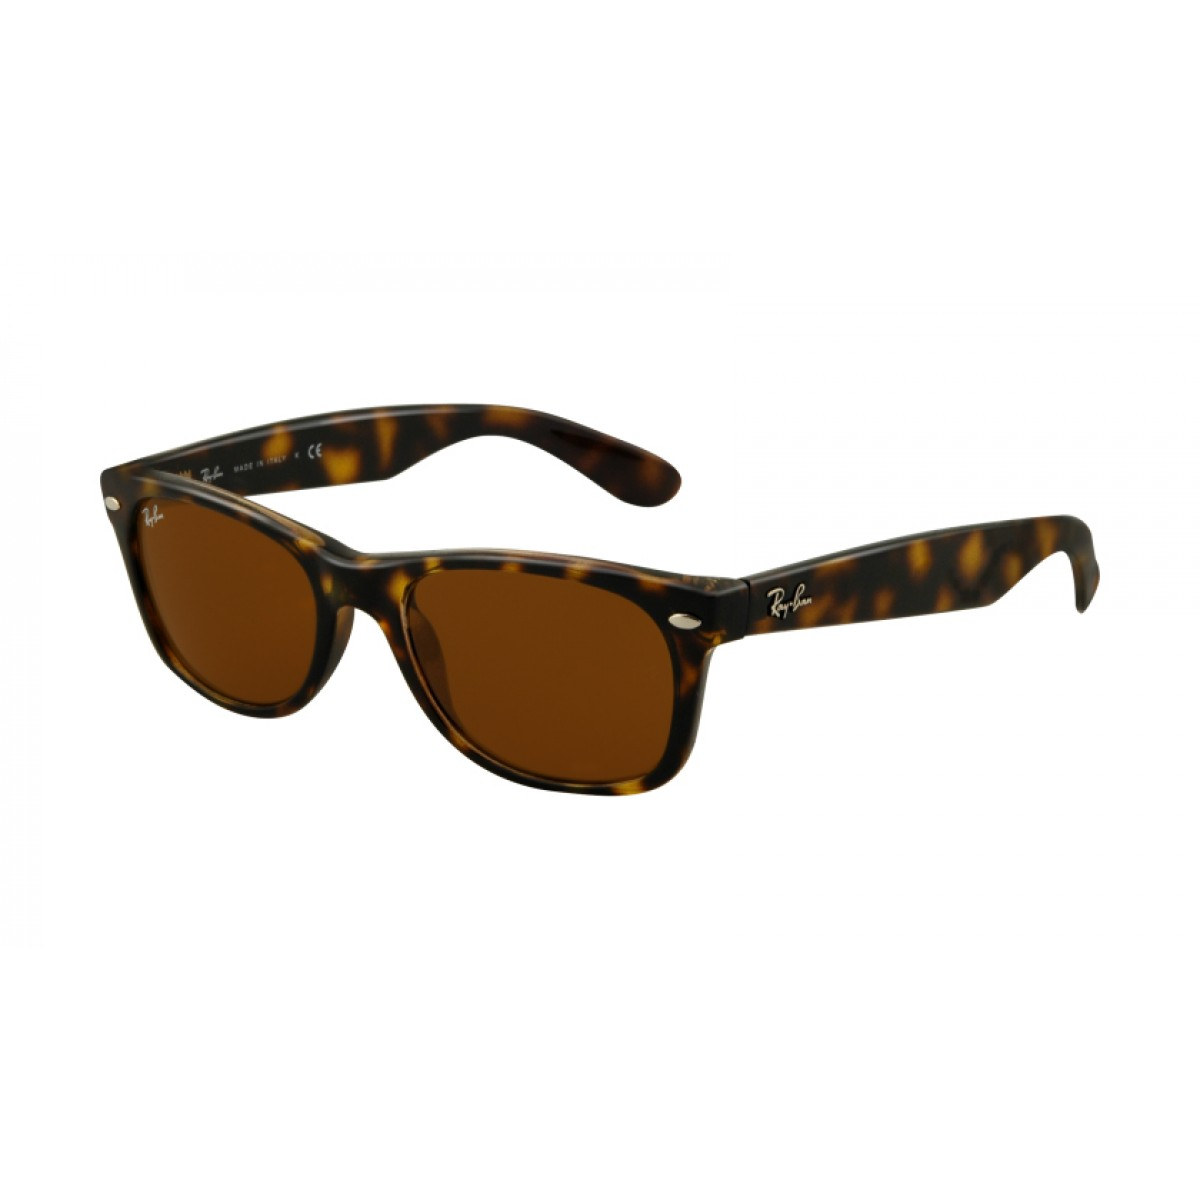 ray_ban_new_wayfarer_sunglasses_tortoiseshell_frame_with_brown_lenses_rb2132-21